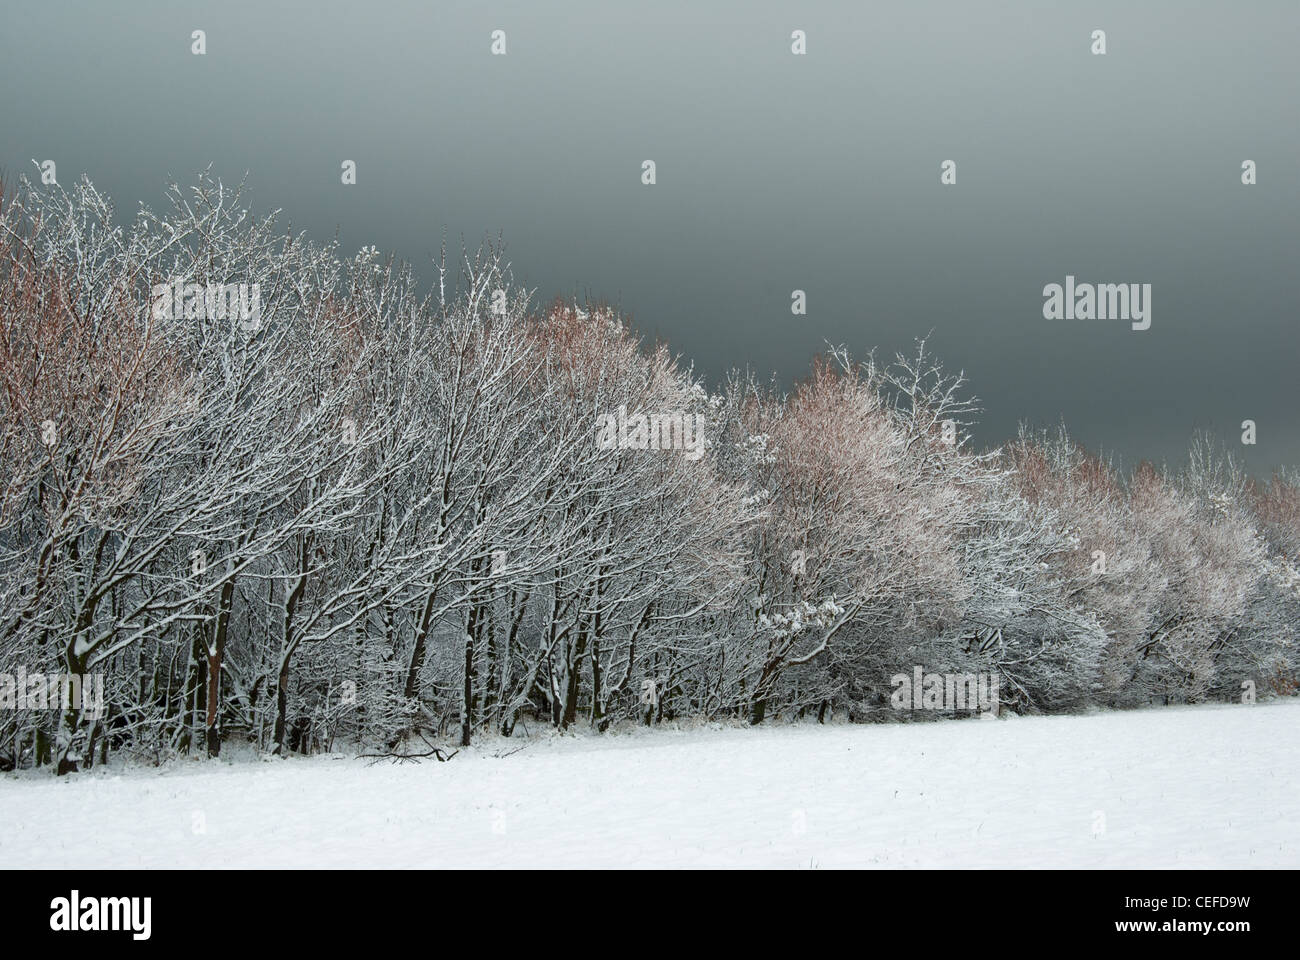 Autumn snow fall - Stock Image